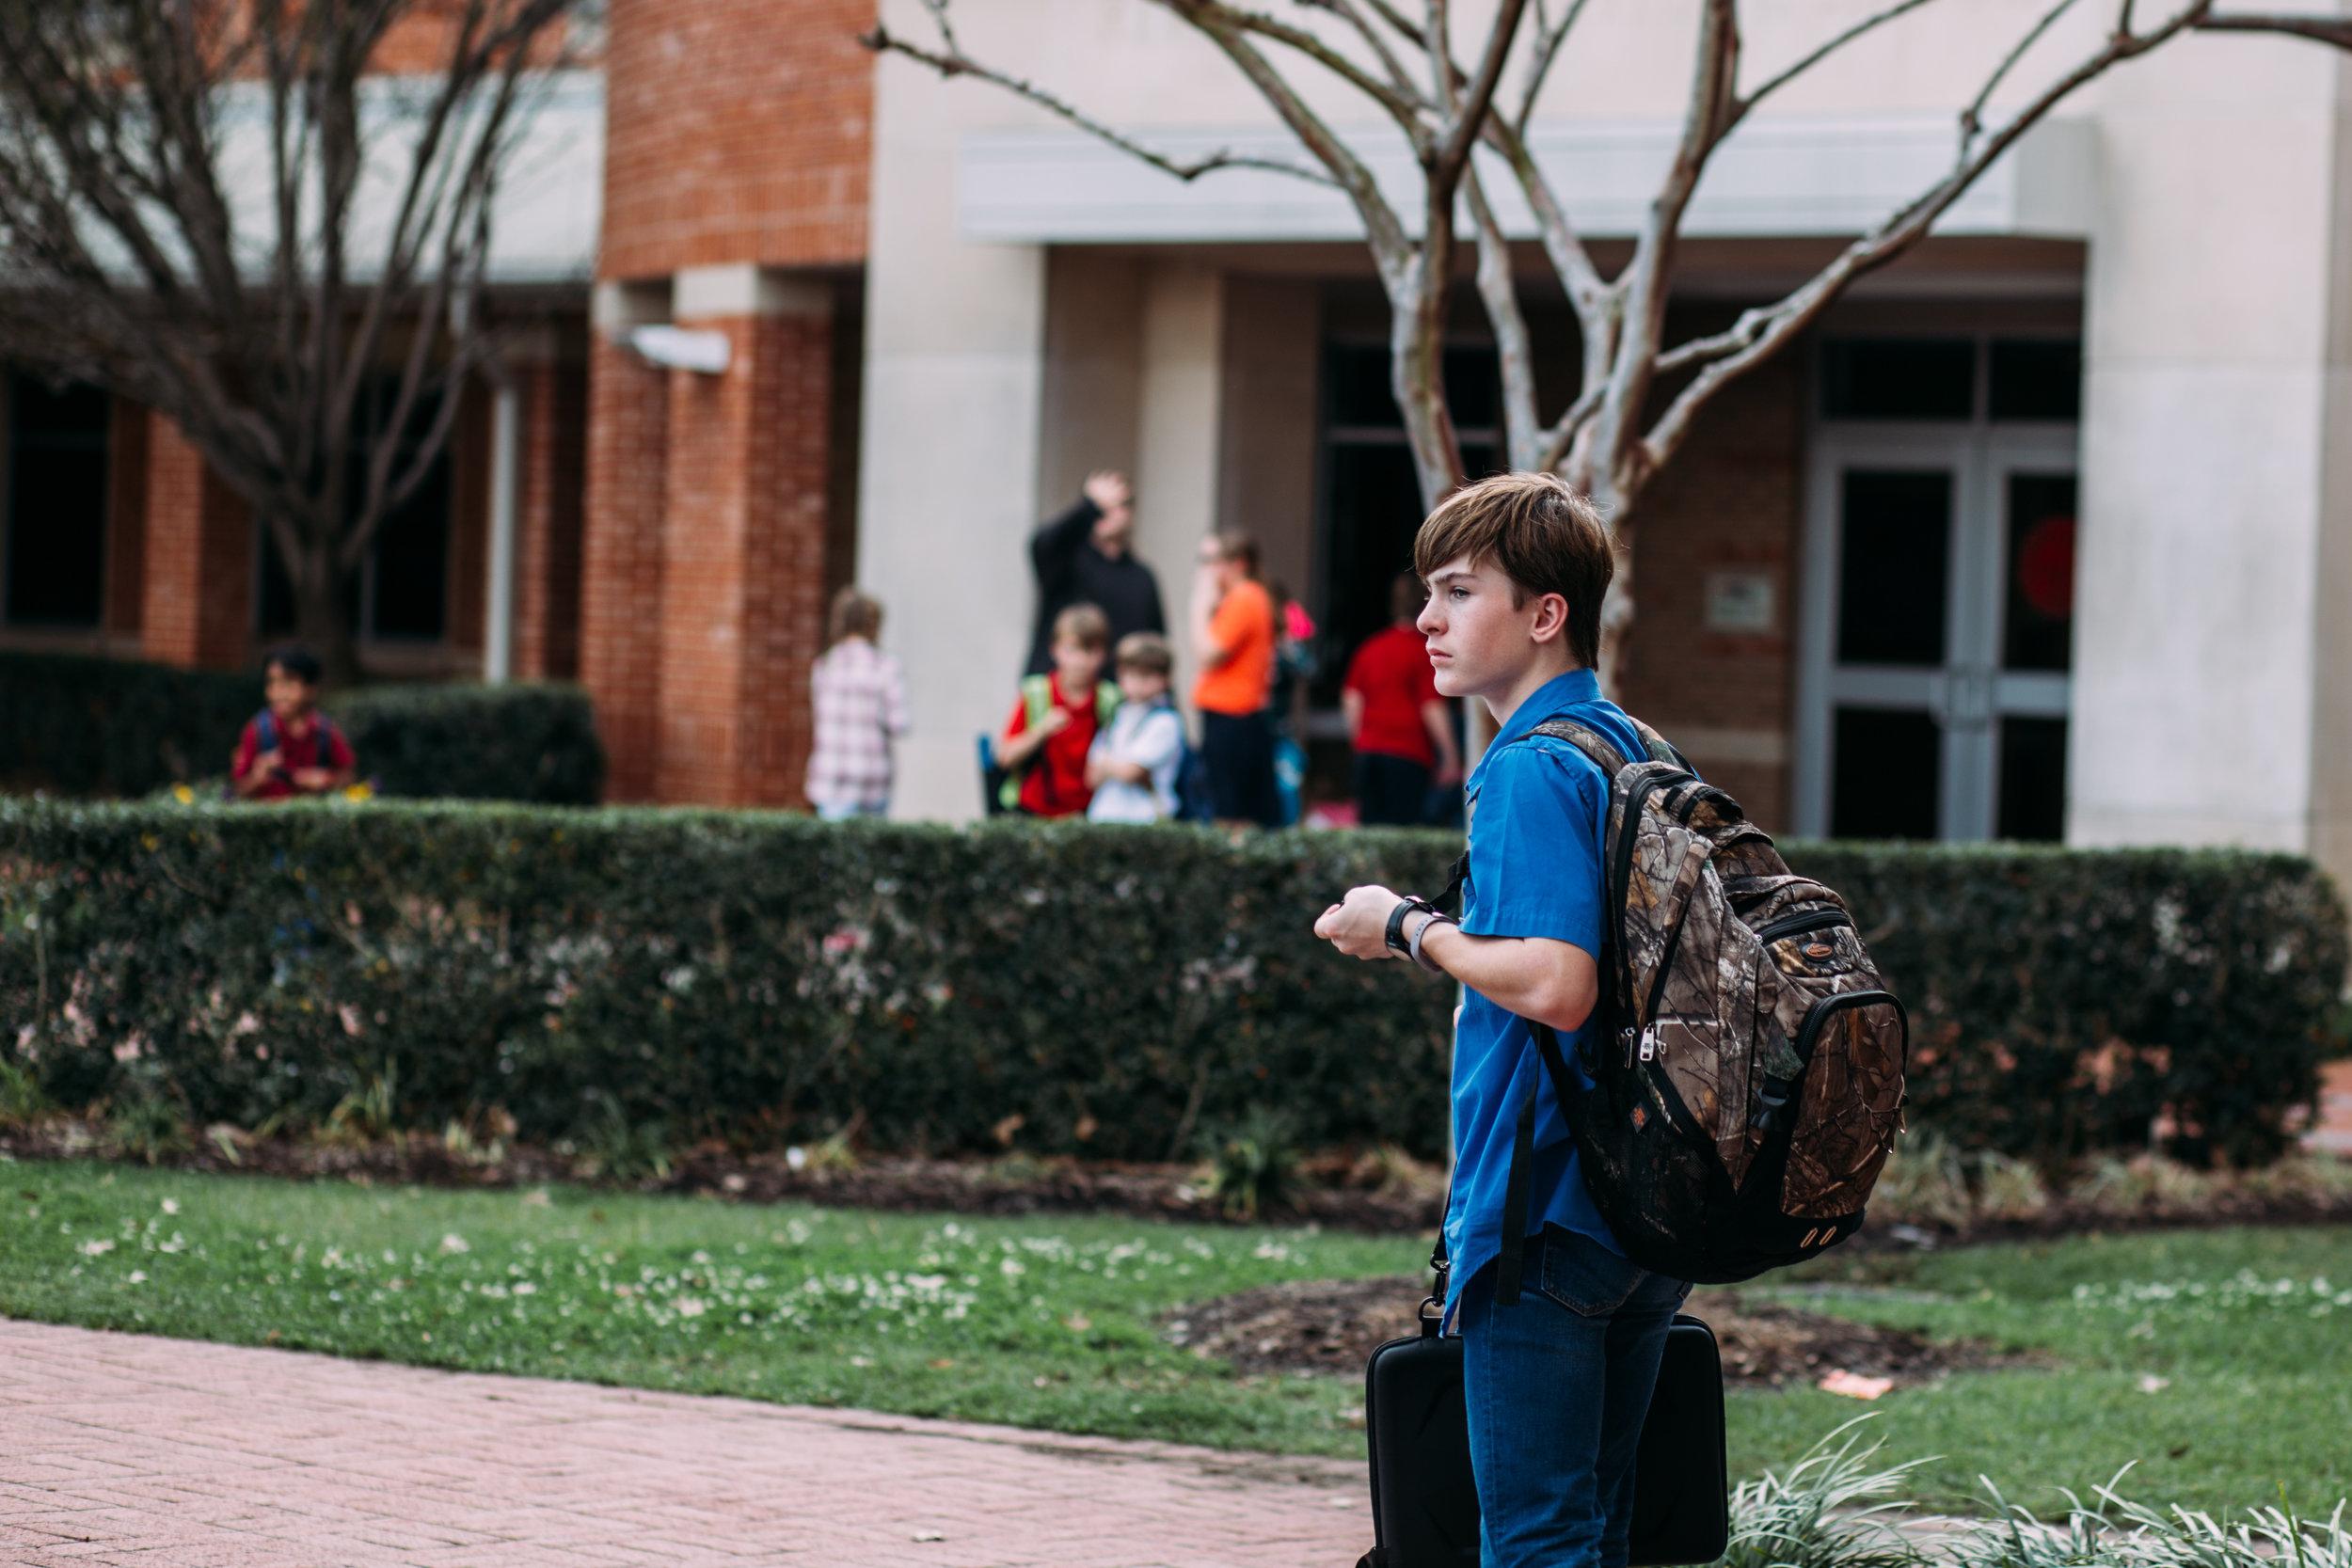 Houston School Photography - 7th River Oaks Baptist School-2.jpg